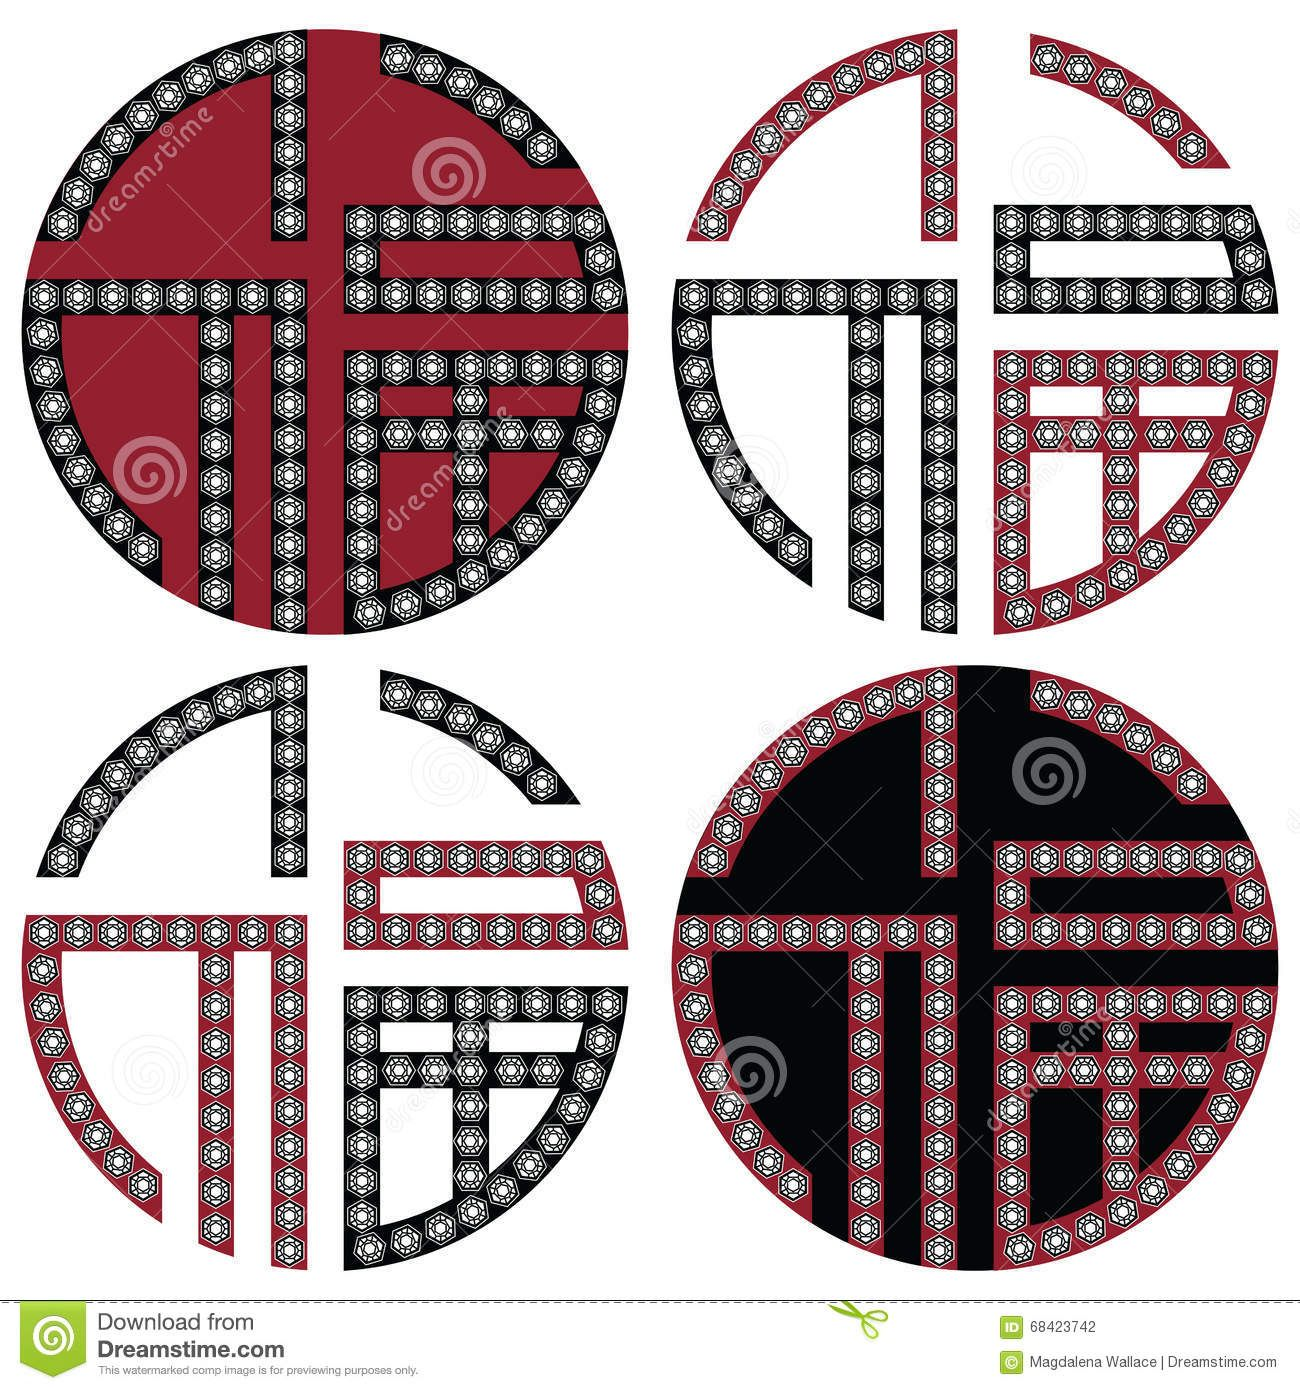 Korean symbols tattoos galleryhip the hippest pics korean symbols tattoos galleryhip the hippest pics biocorpaavc Images